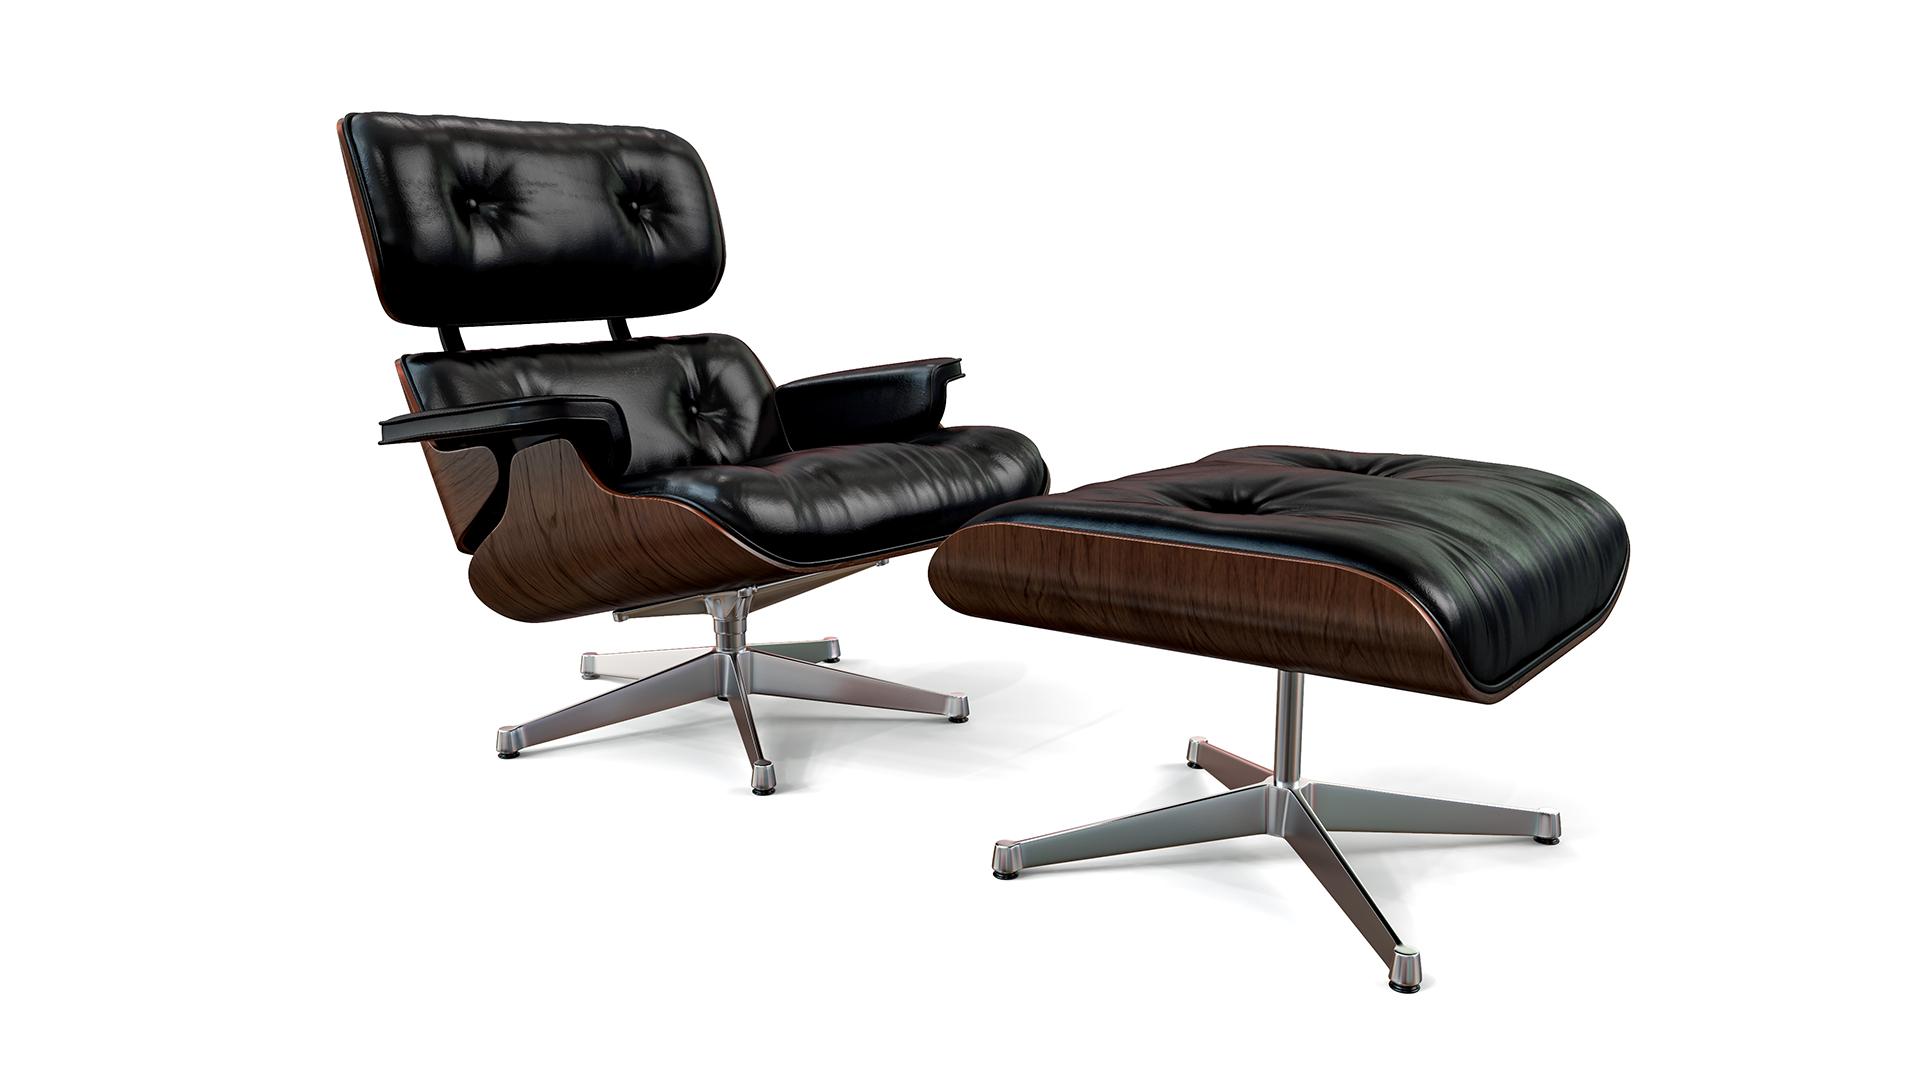 Furniture Studio Rendering Chair